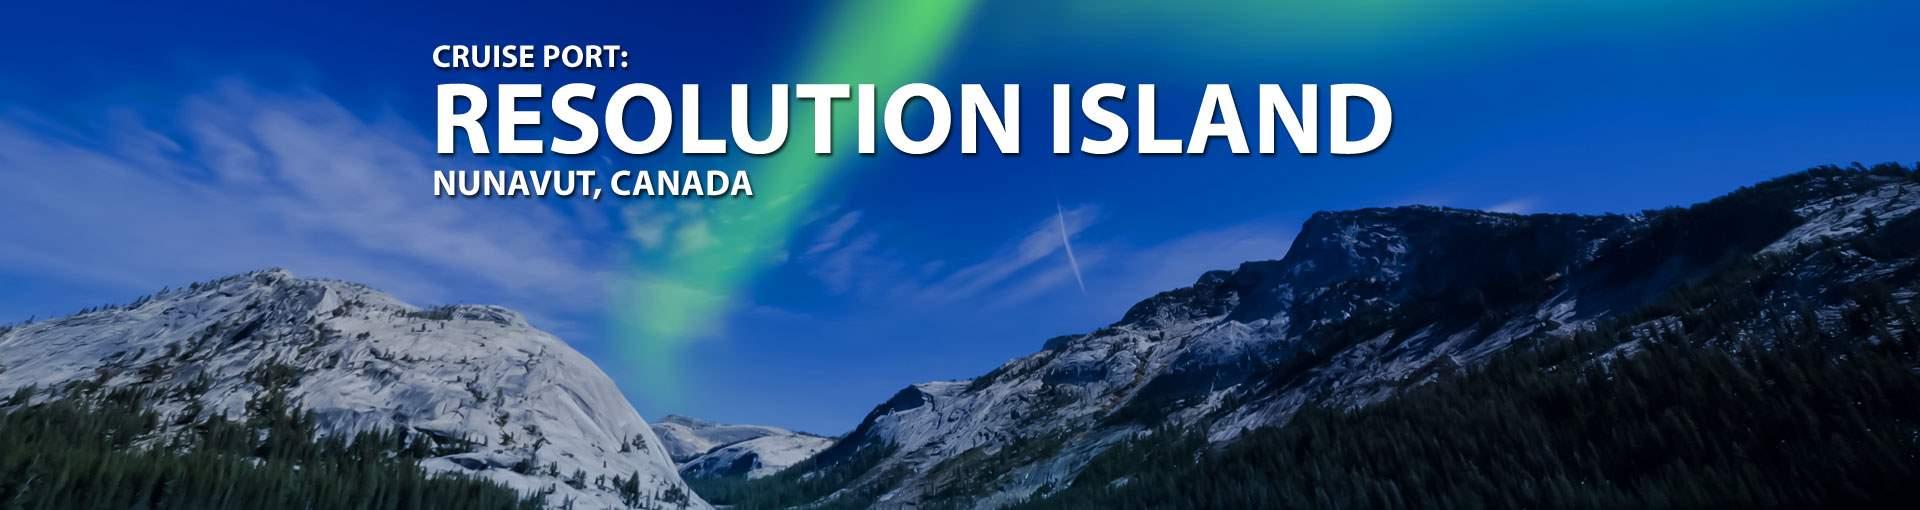 Cruises to Resolution Island, Nunavut, Canada